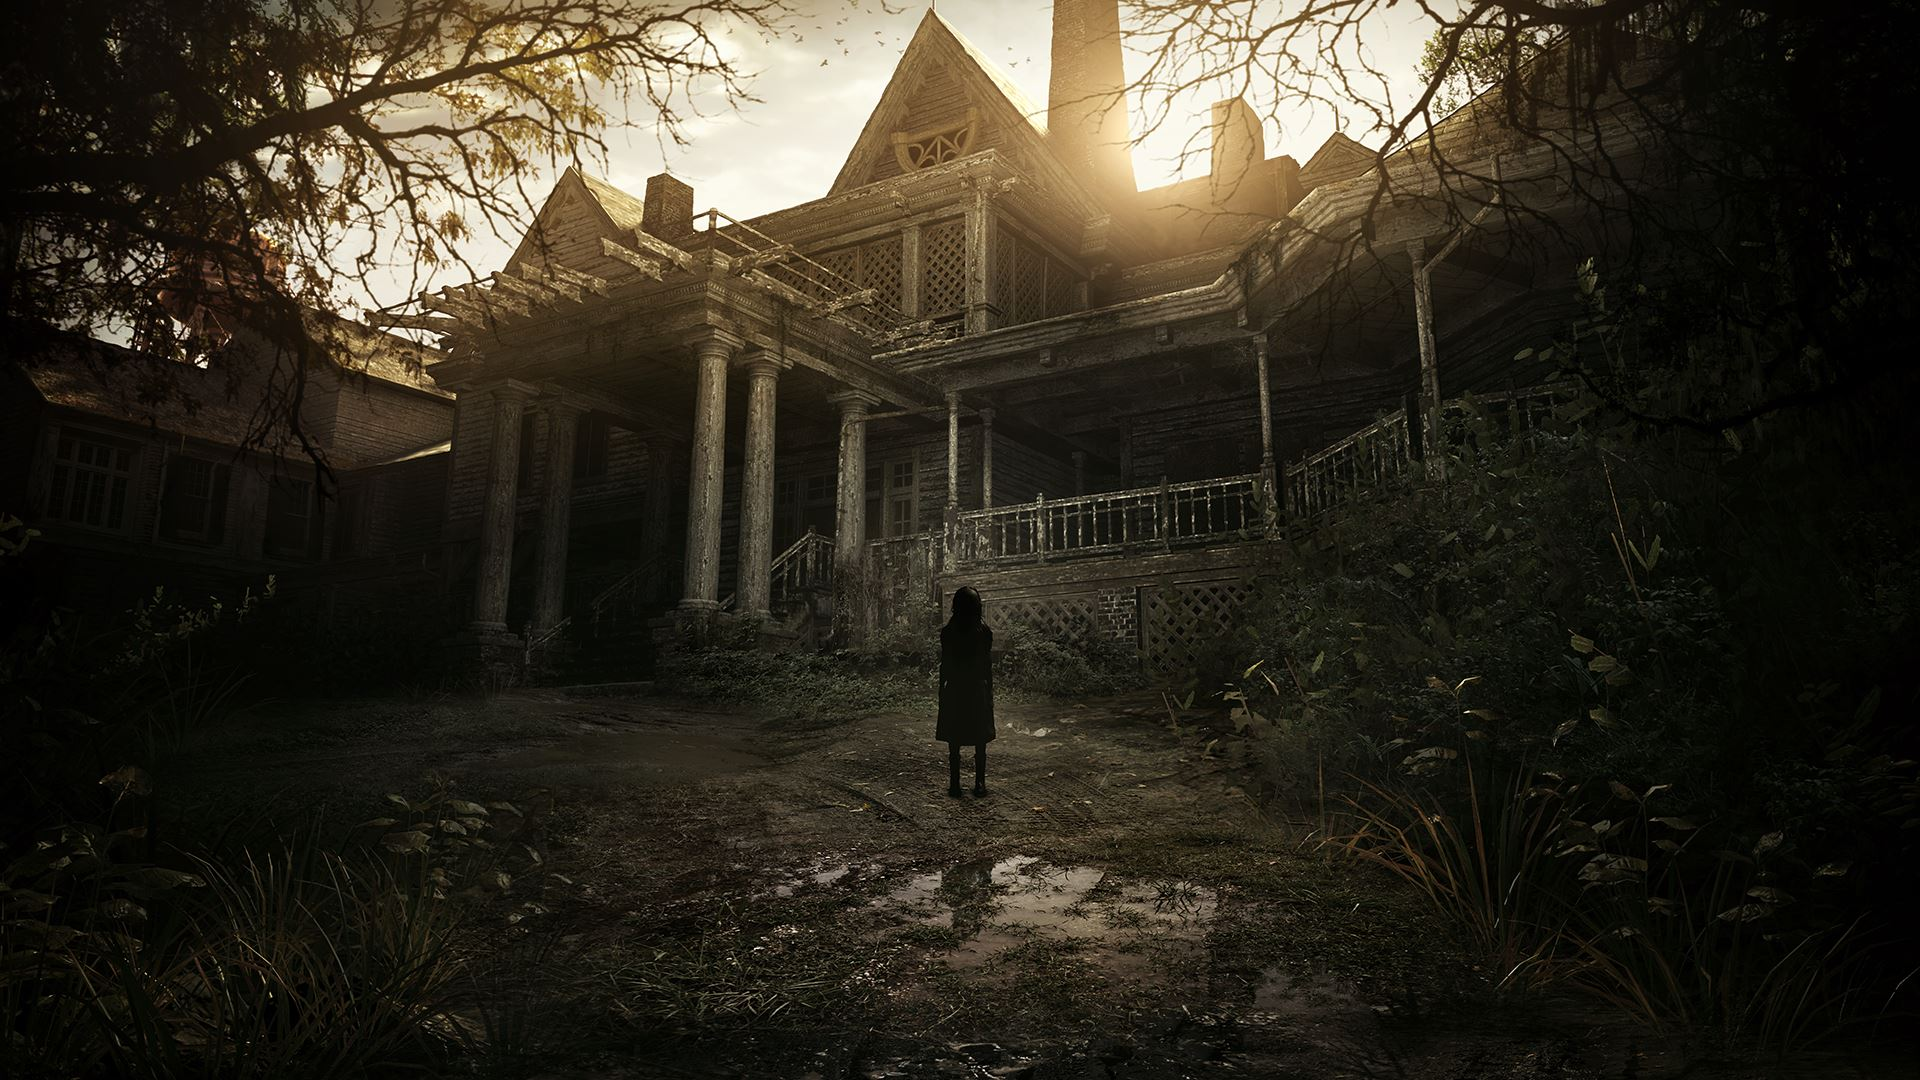 Crítica: Resident Evil 7 – Biohazard